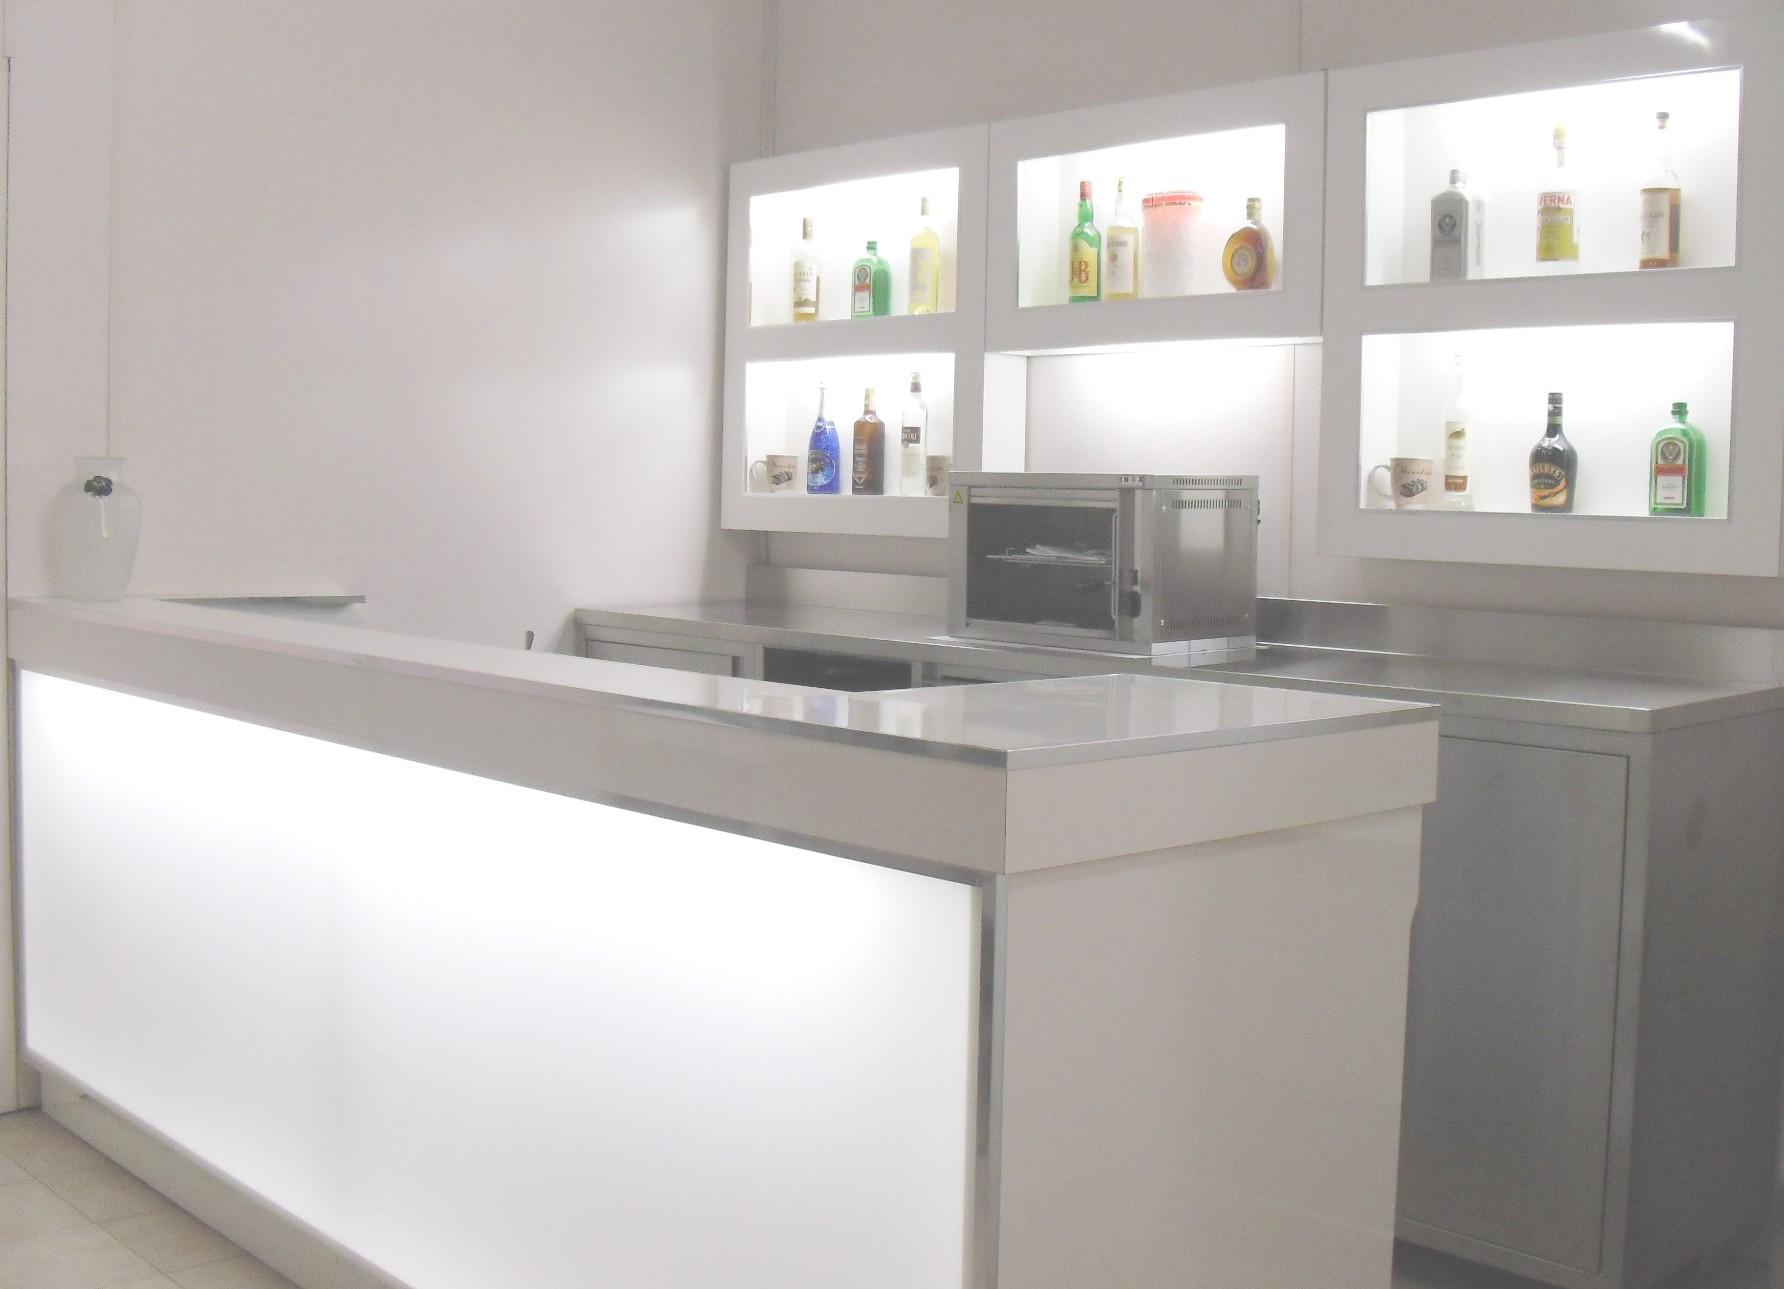 Tecnica prezzi banco frigo prezzi for Banco frigo bar usato